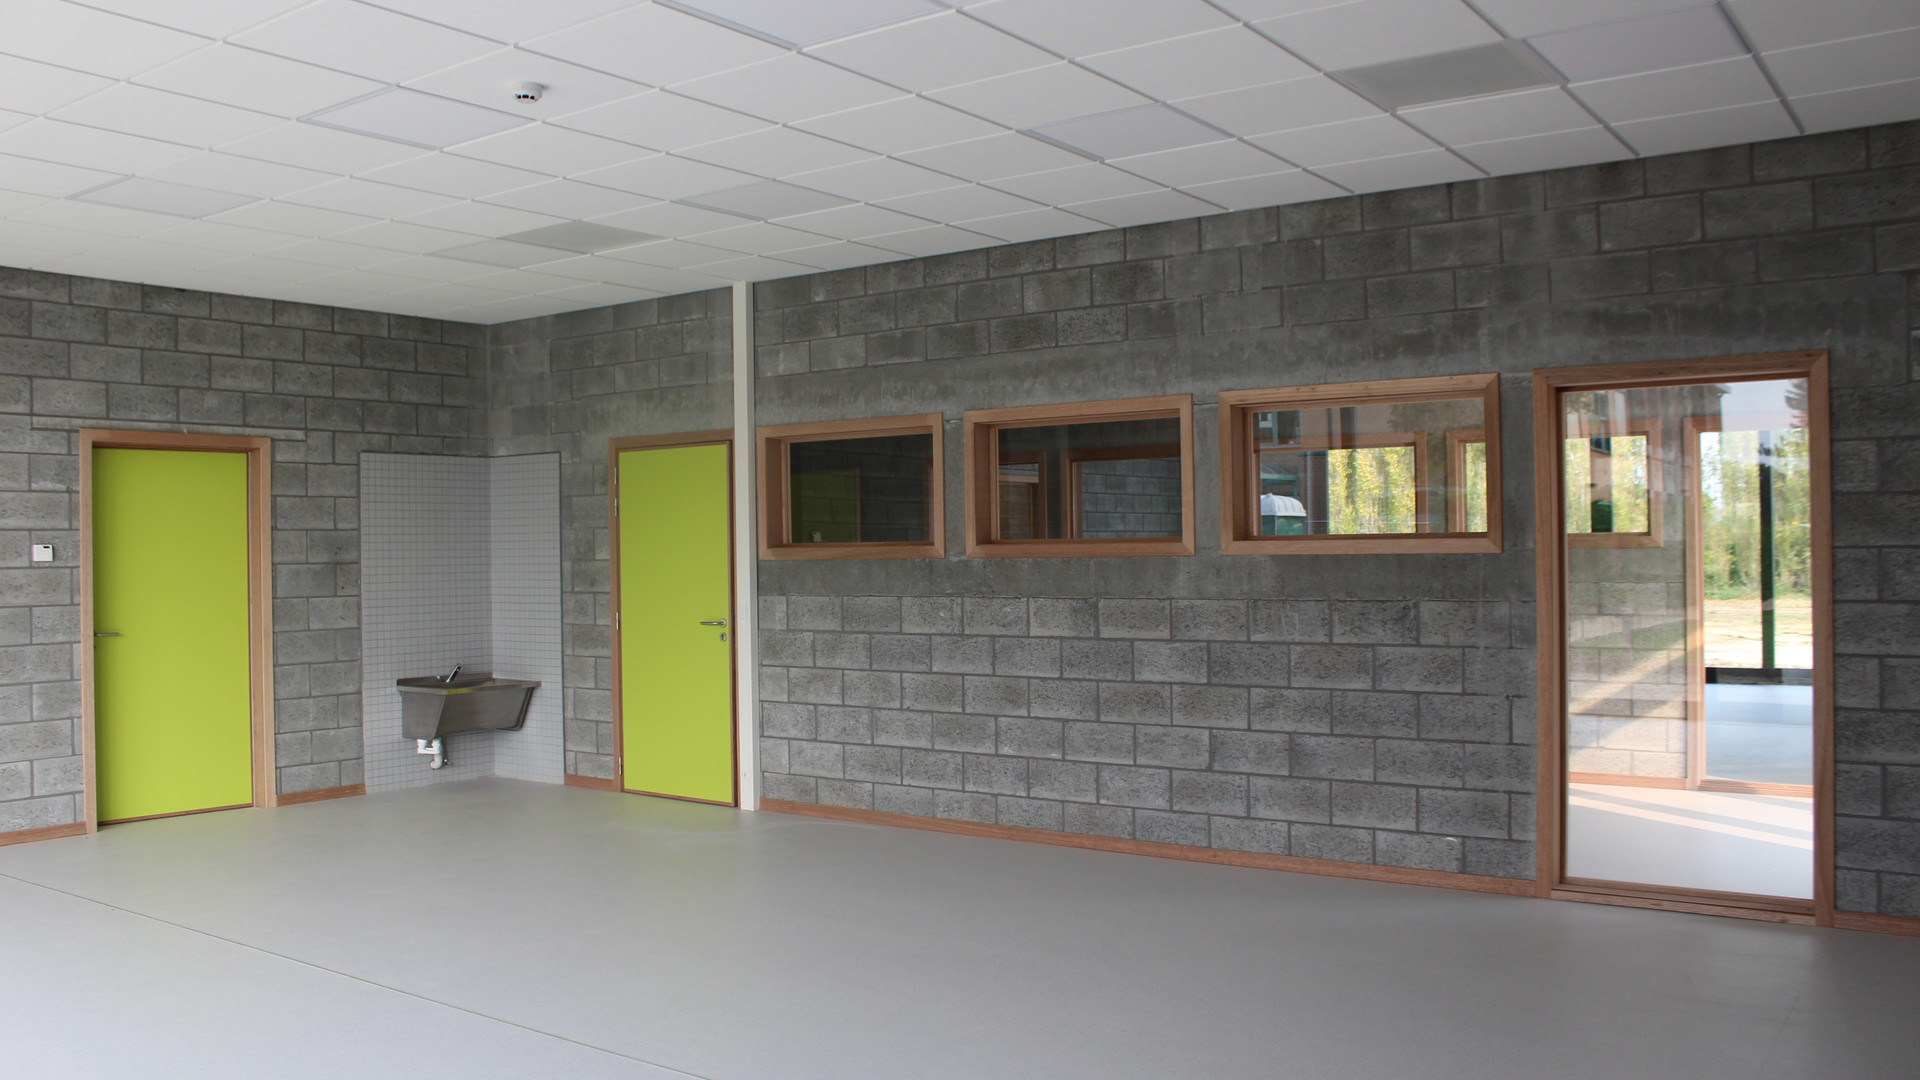 Basisschool De Pimpernel